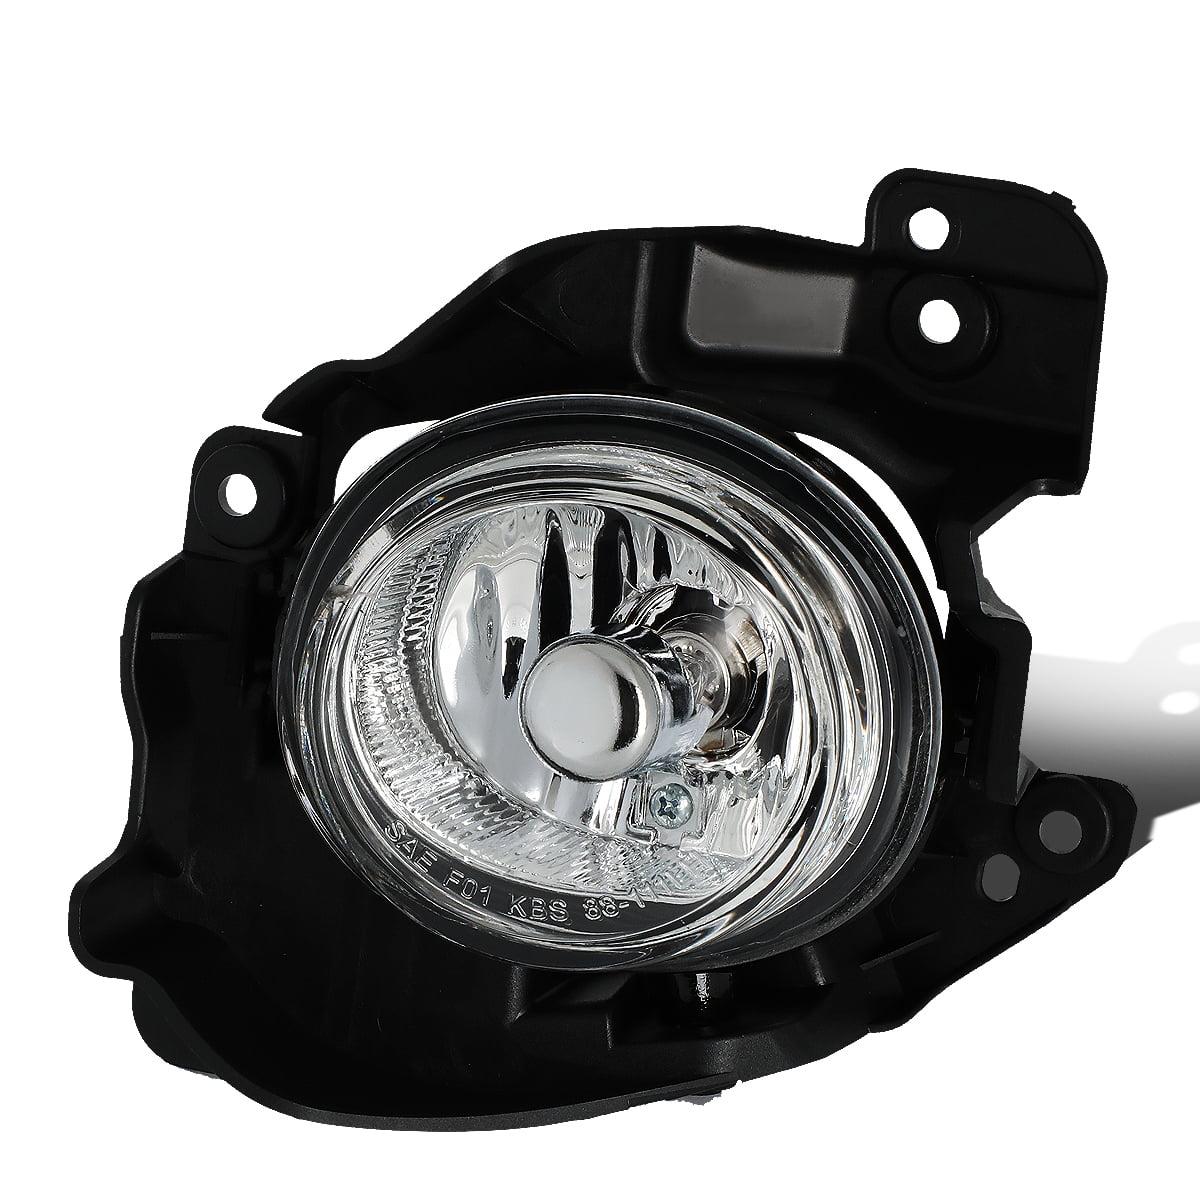 For 10-13 Mazdaspeed 3 Front Bumper Fog Light/Lamp Factory Style Left Side 11 12